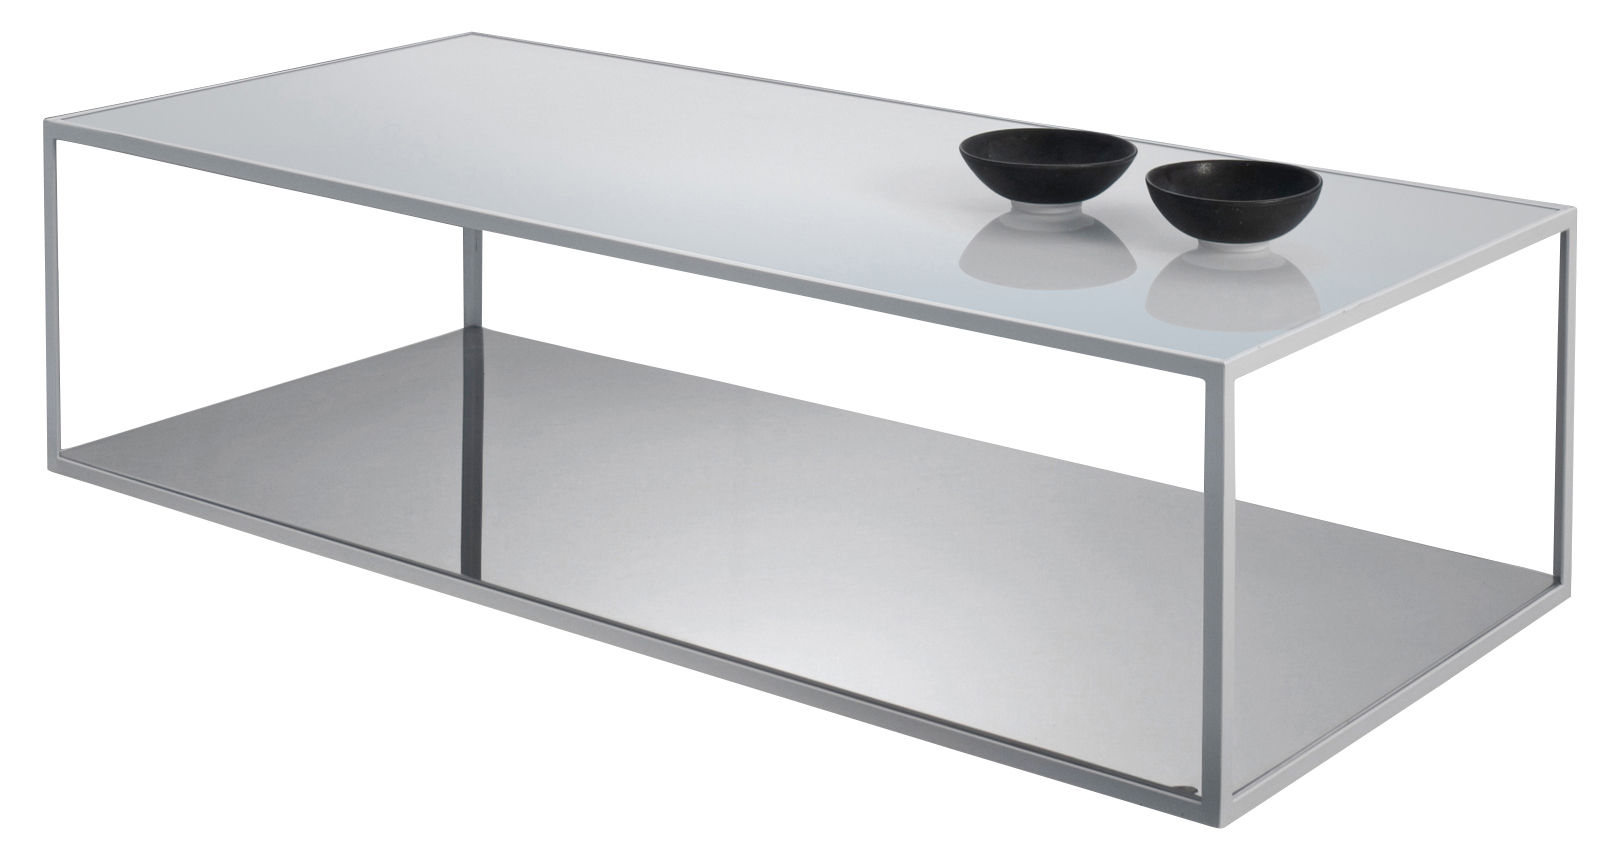 table basse double skin verre blanc acier inoxydable. Black Bedroom Furniture Sets. Home Design Ideas